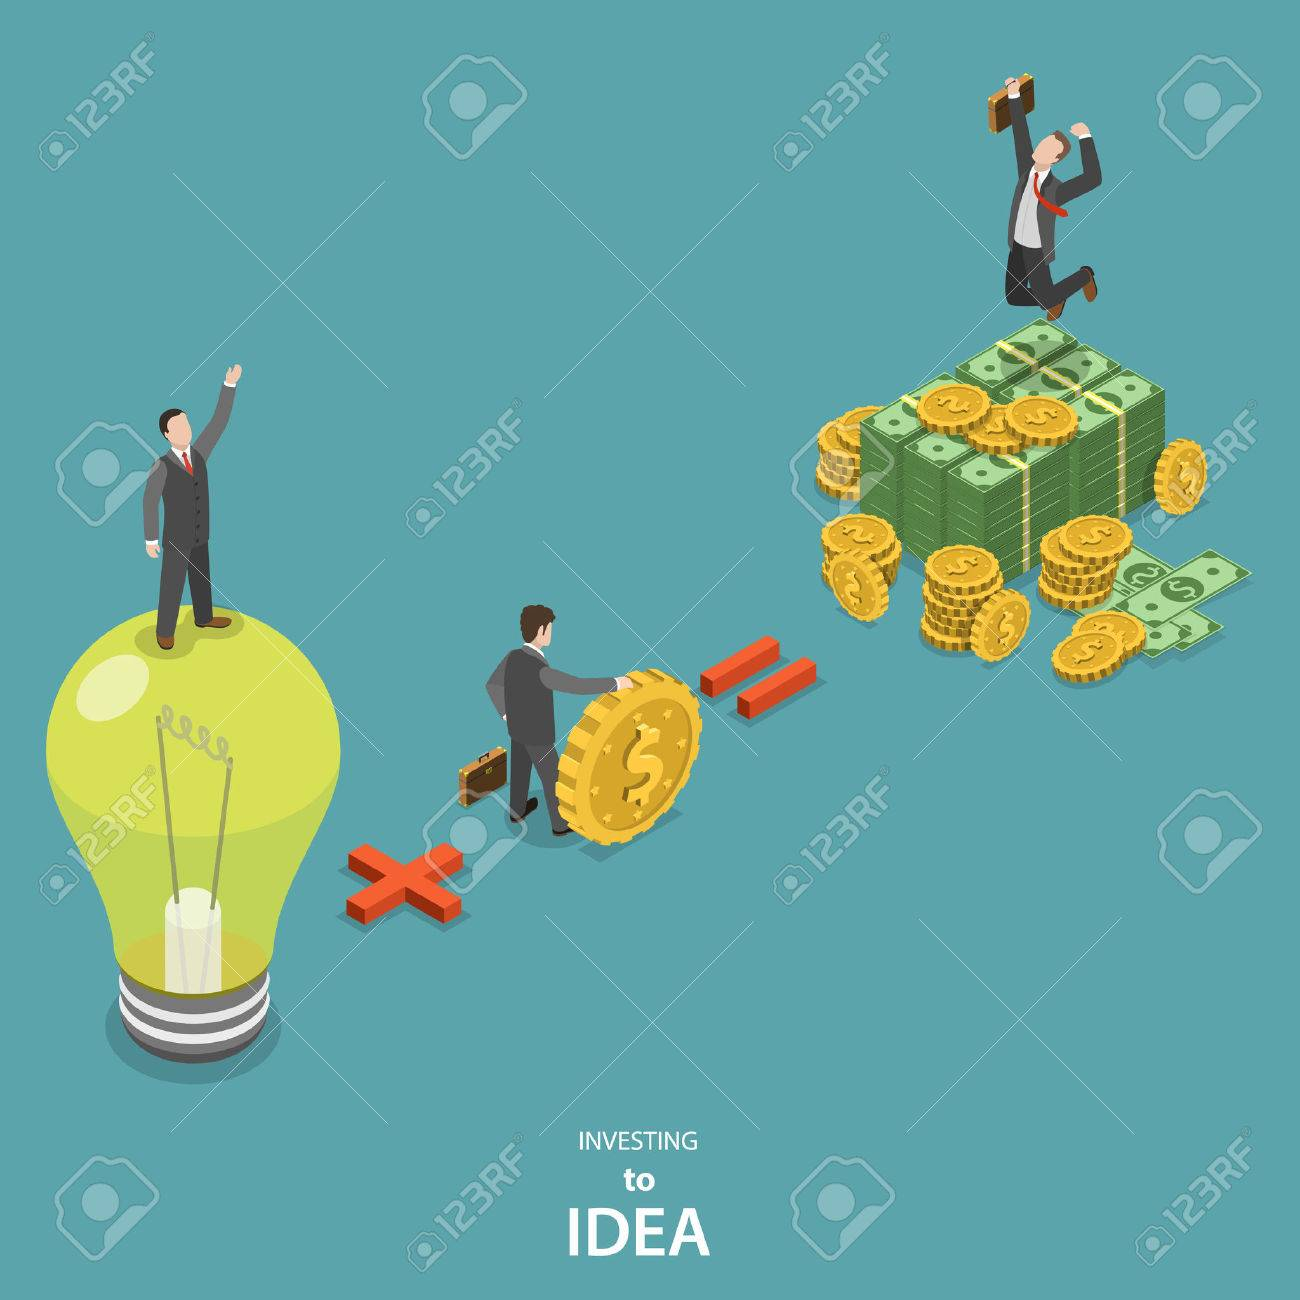 Investing into idea isometric flat vector concept. Idea plus investor is a huge profit. - 50042289